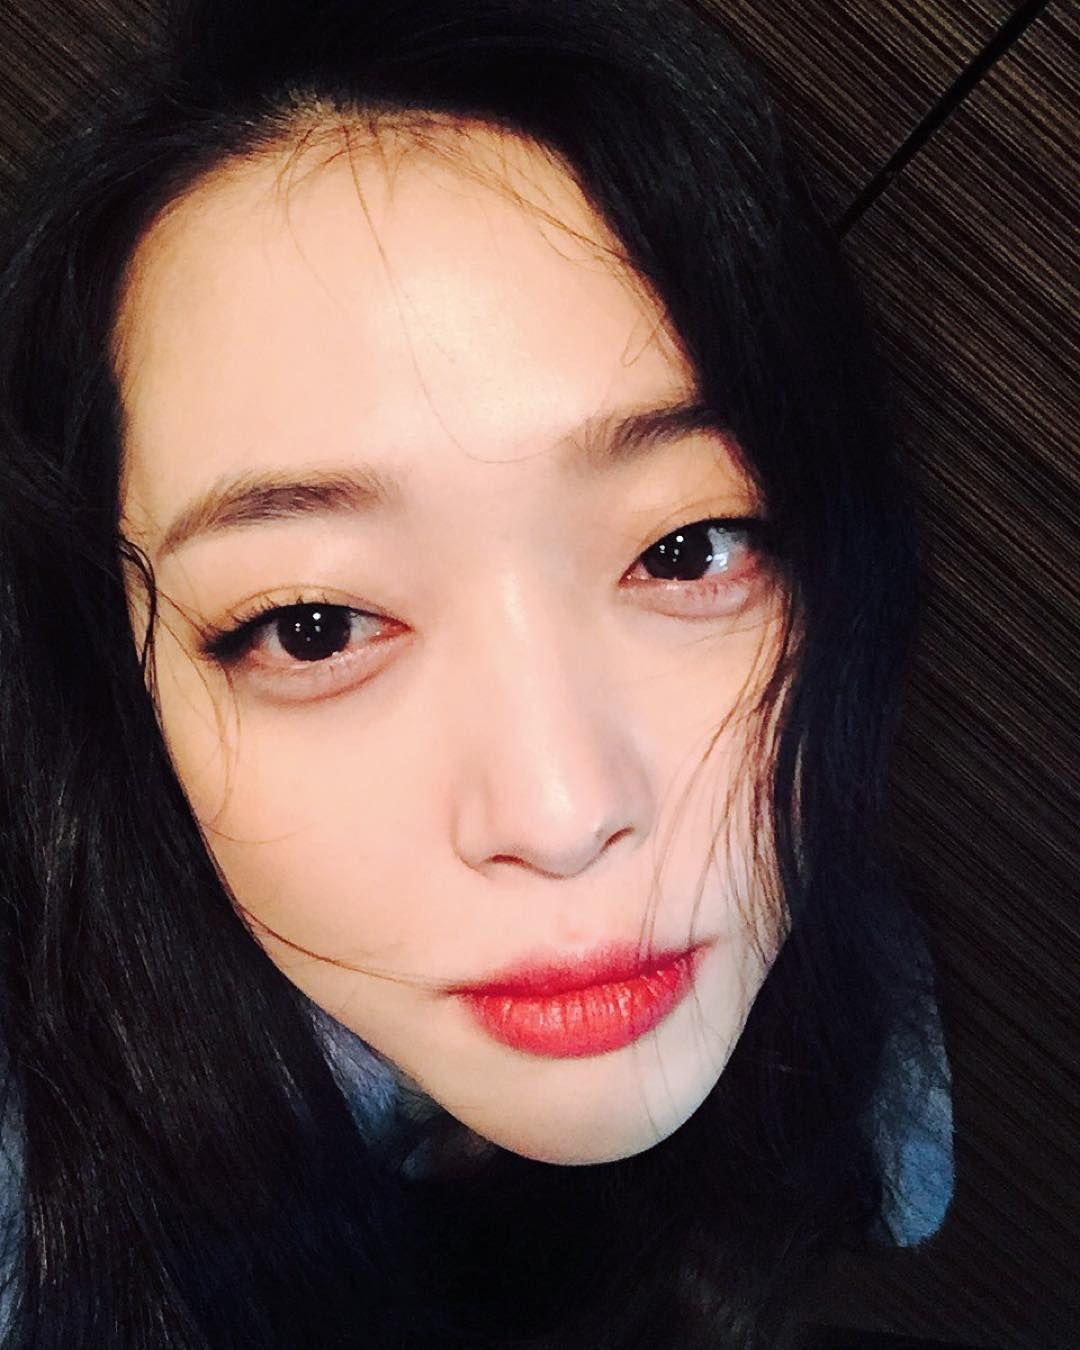 Kara Nicole   Nicole kara, Kpop girls, Kim sang